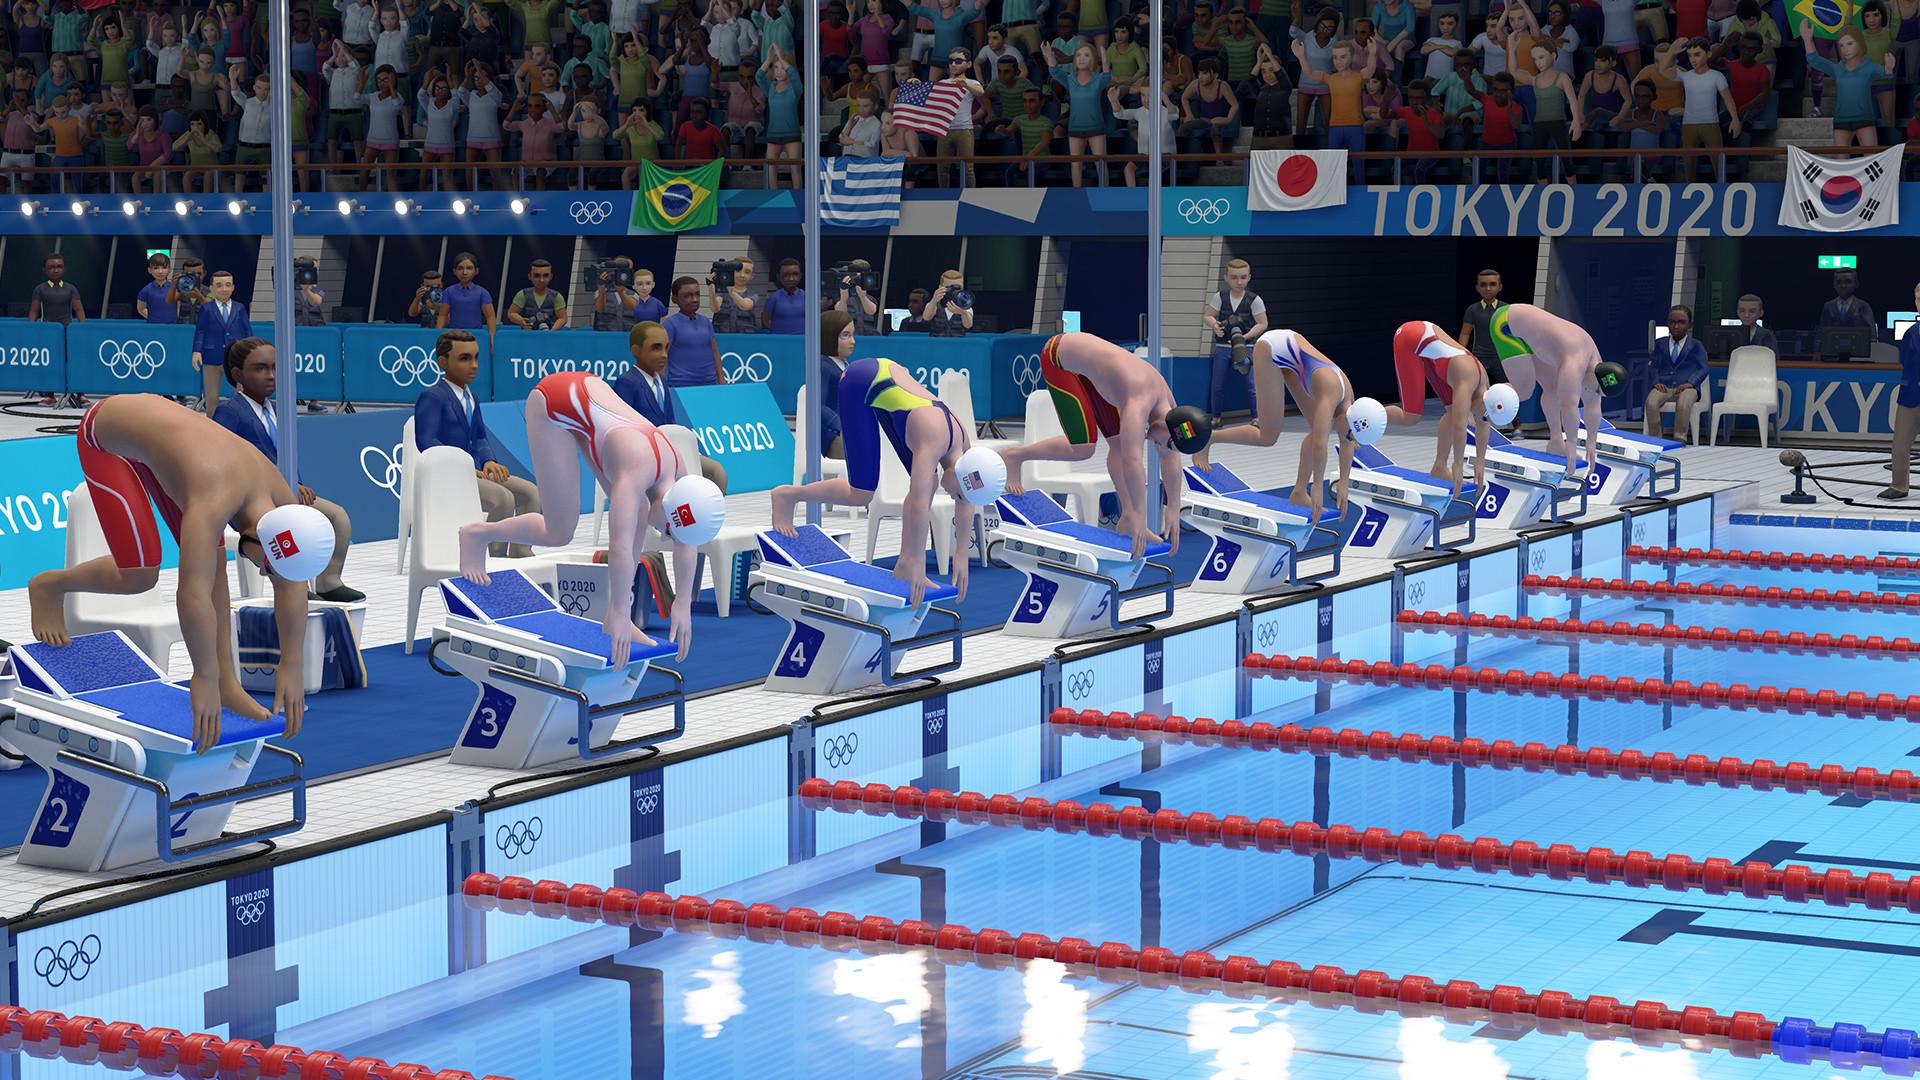 olympic-games-tokyo-2020-pc-screenshot-1